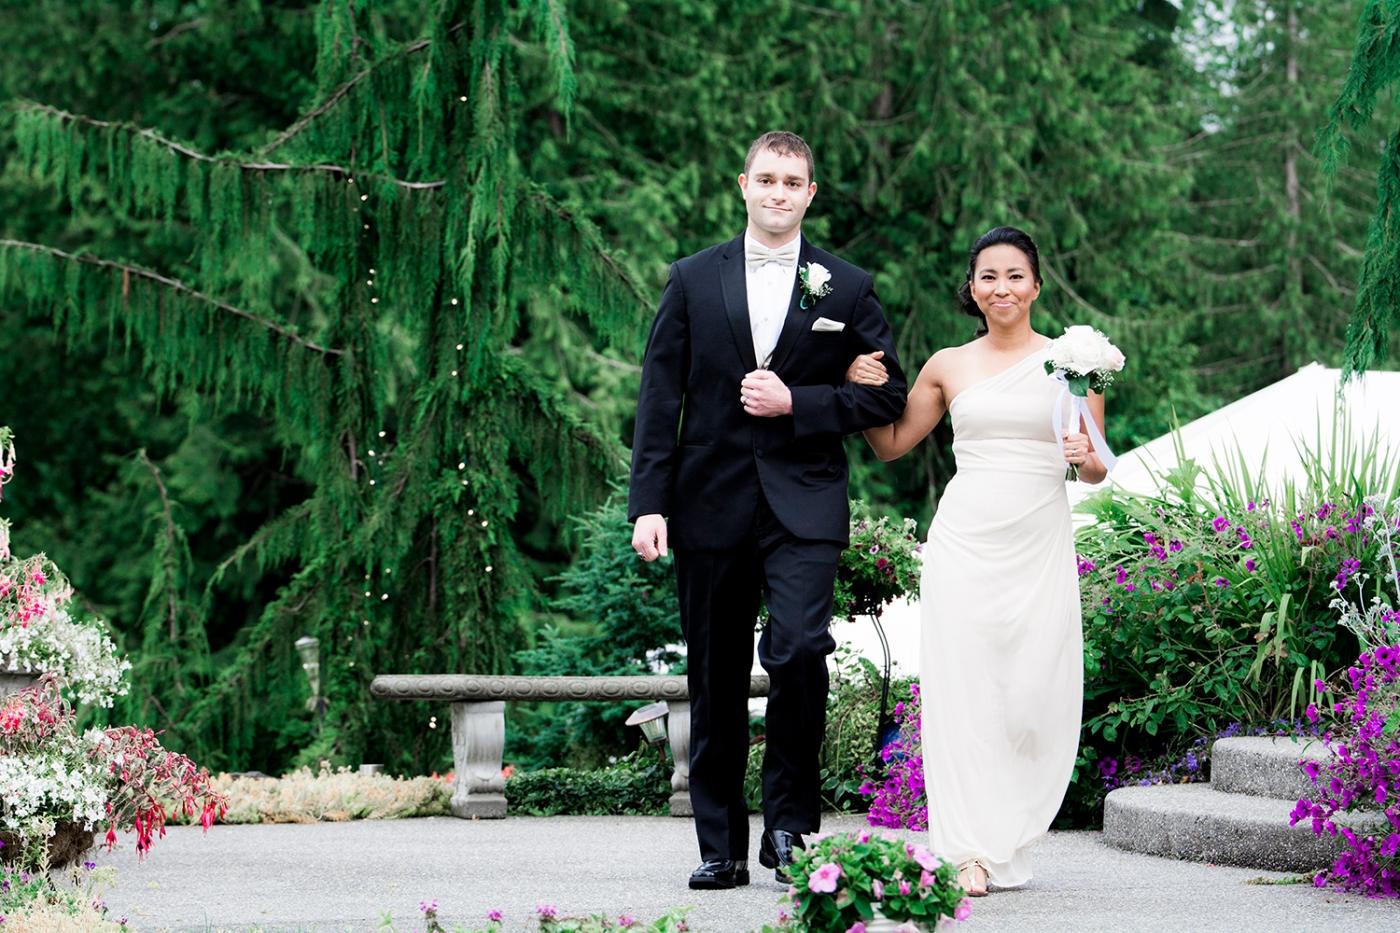 Jane_Speleers_2016_Details_Wedding_Wild_Rose_Estates_Venue_JS7_7722